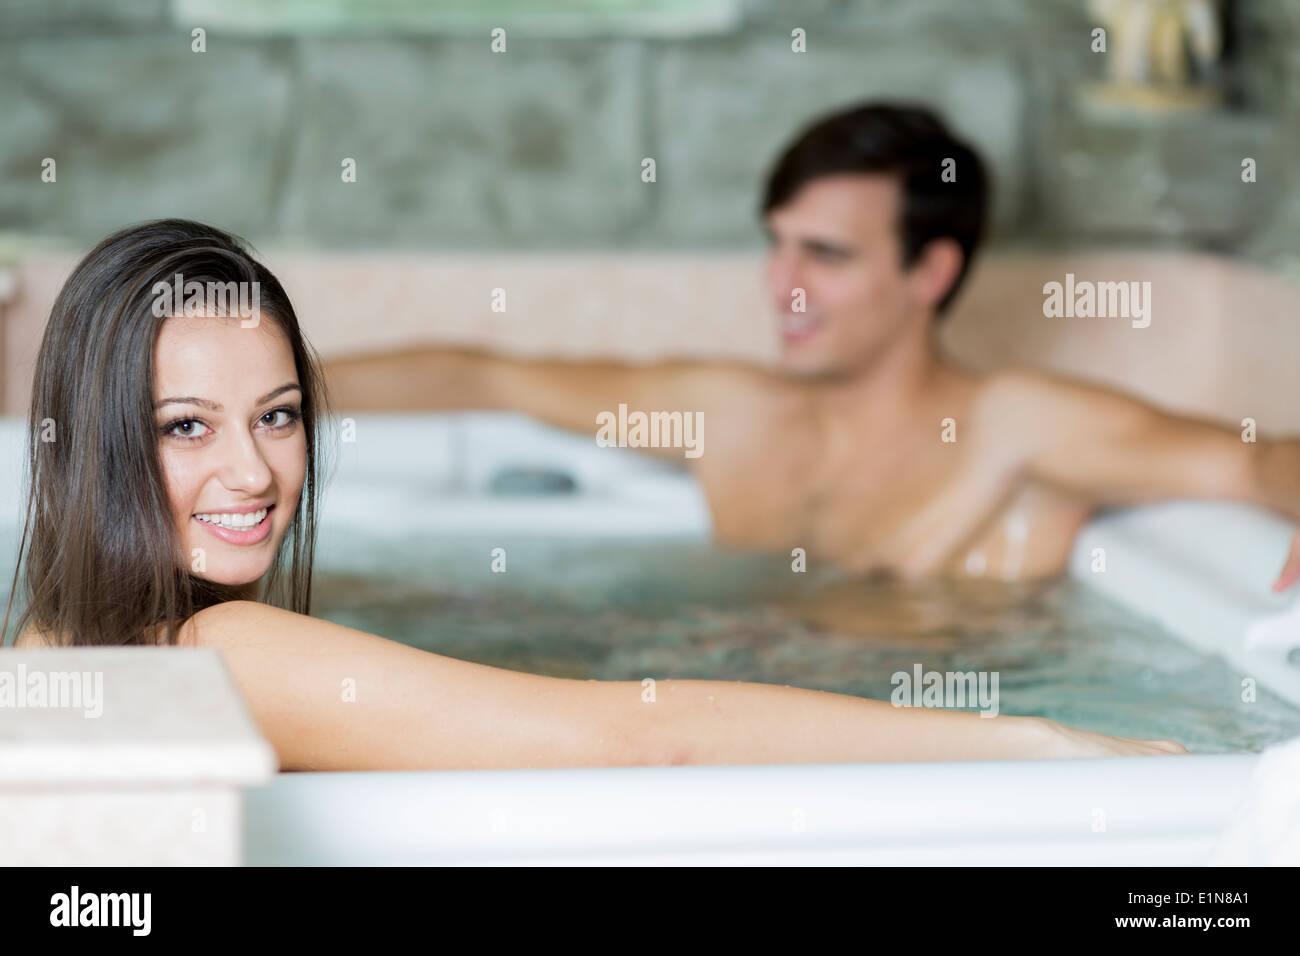 Pareja joven relajándose en el jacuzzi Imagen De Stock